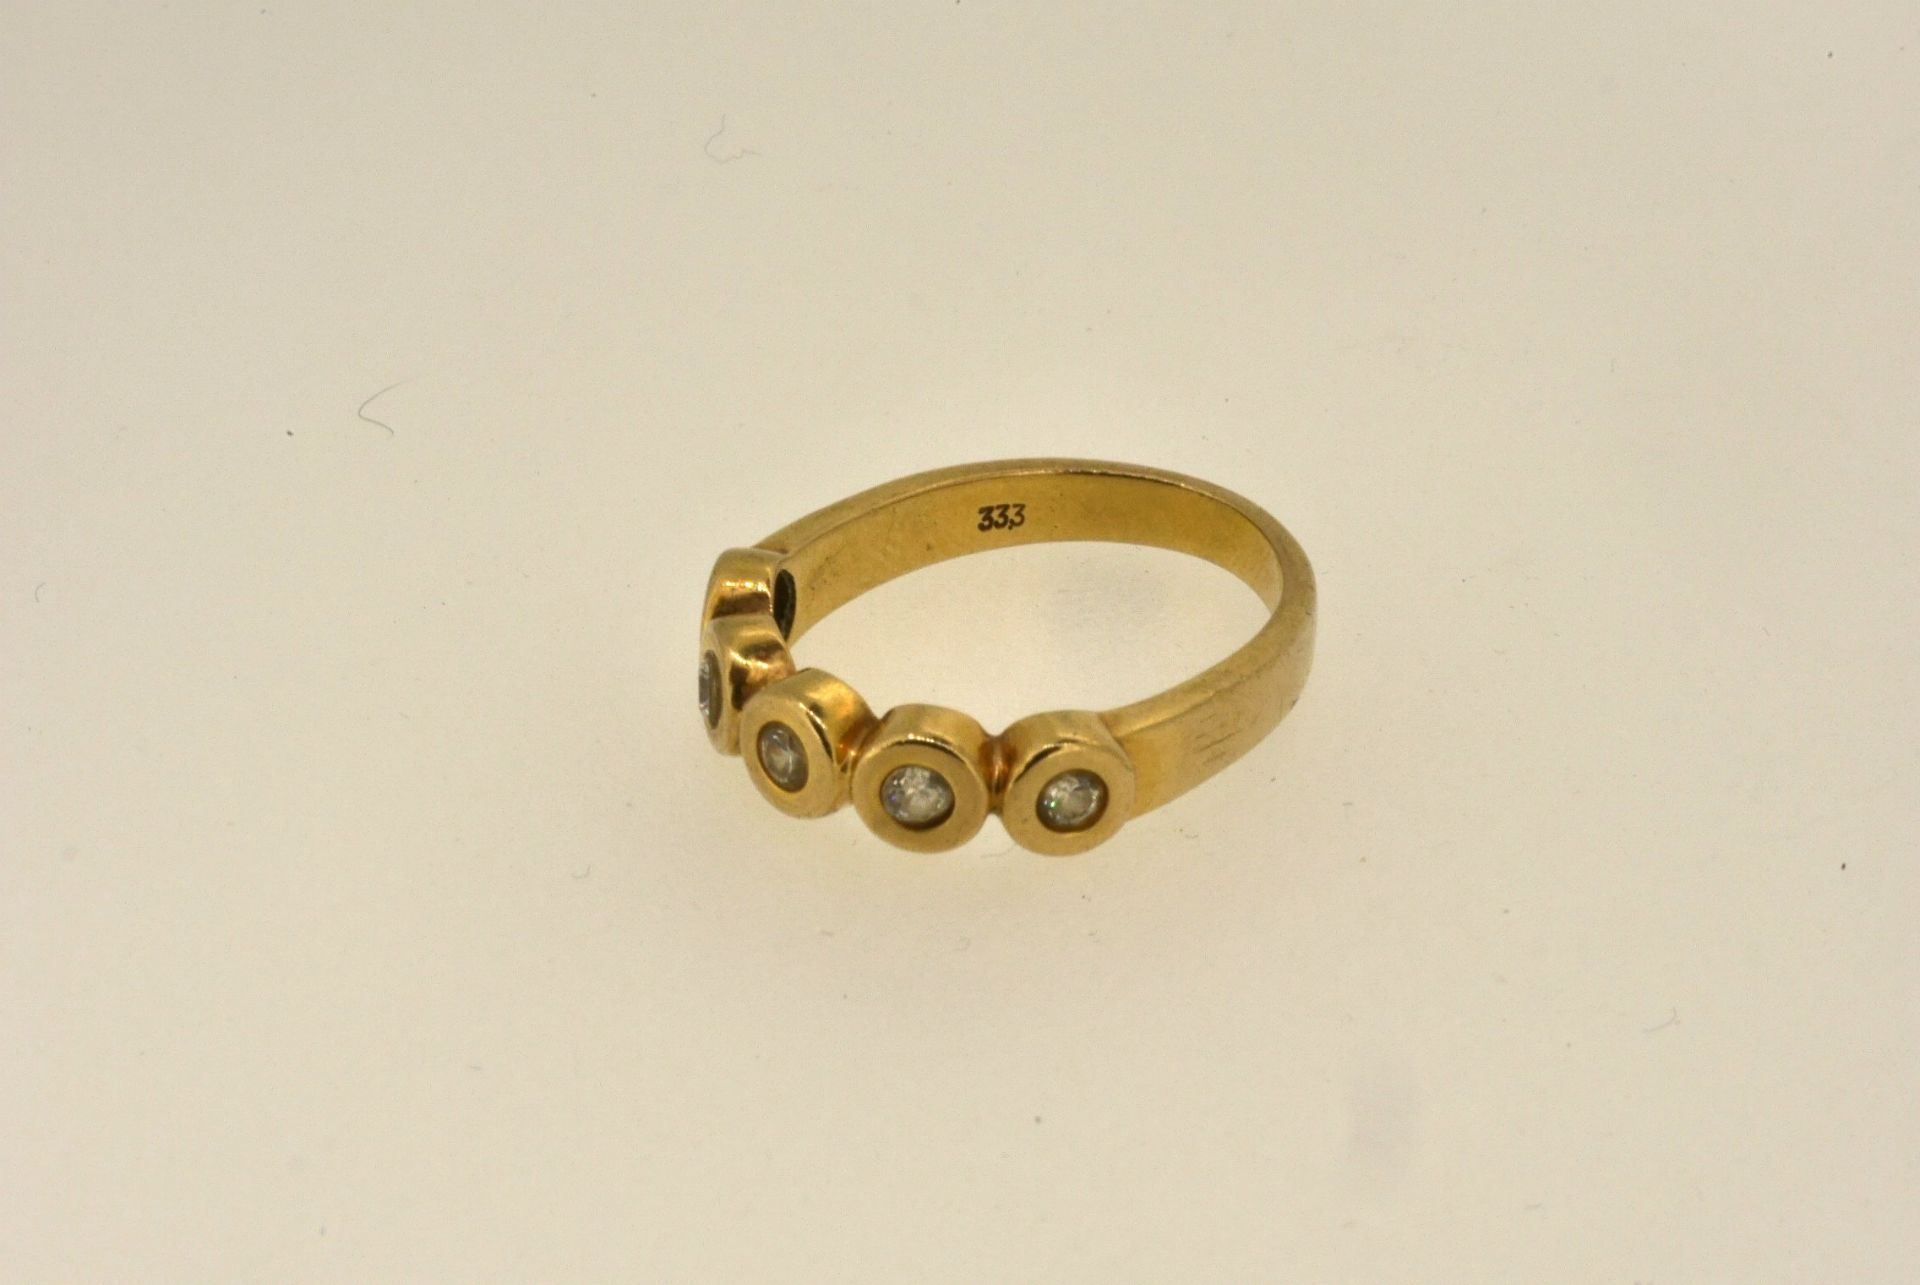 Ring GG 333, Zirkonia, 3,36 Gramm